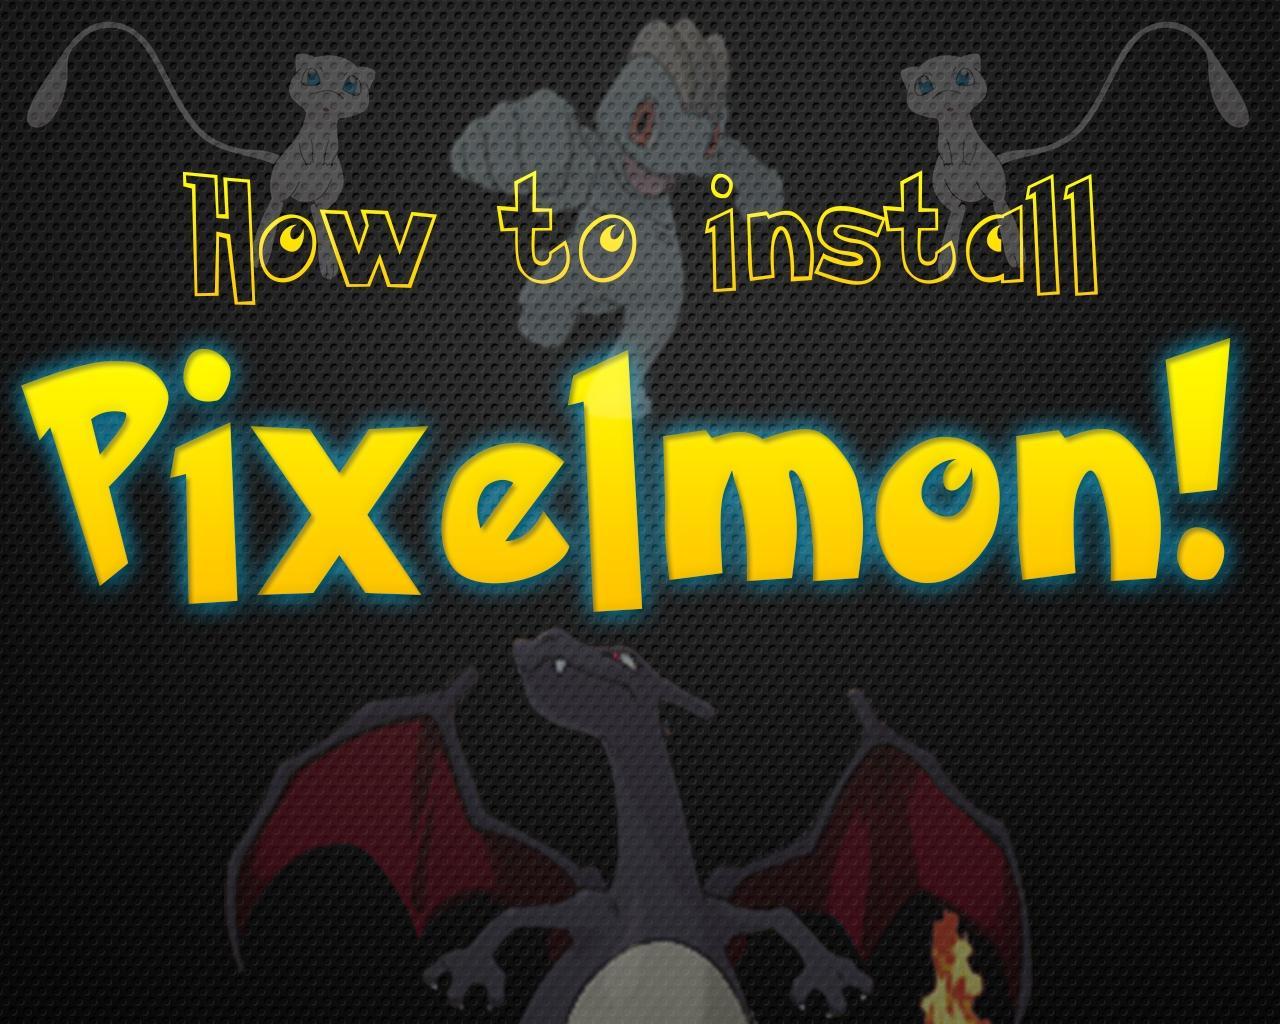 How to get pixelmon on minecraft 1.6.2